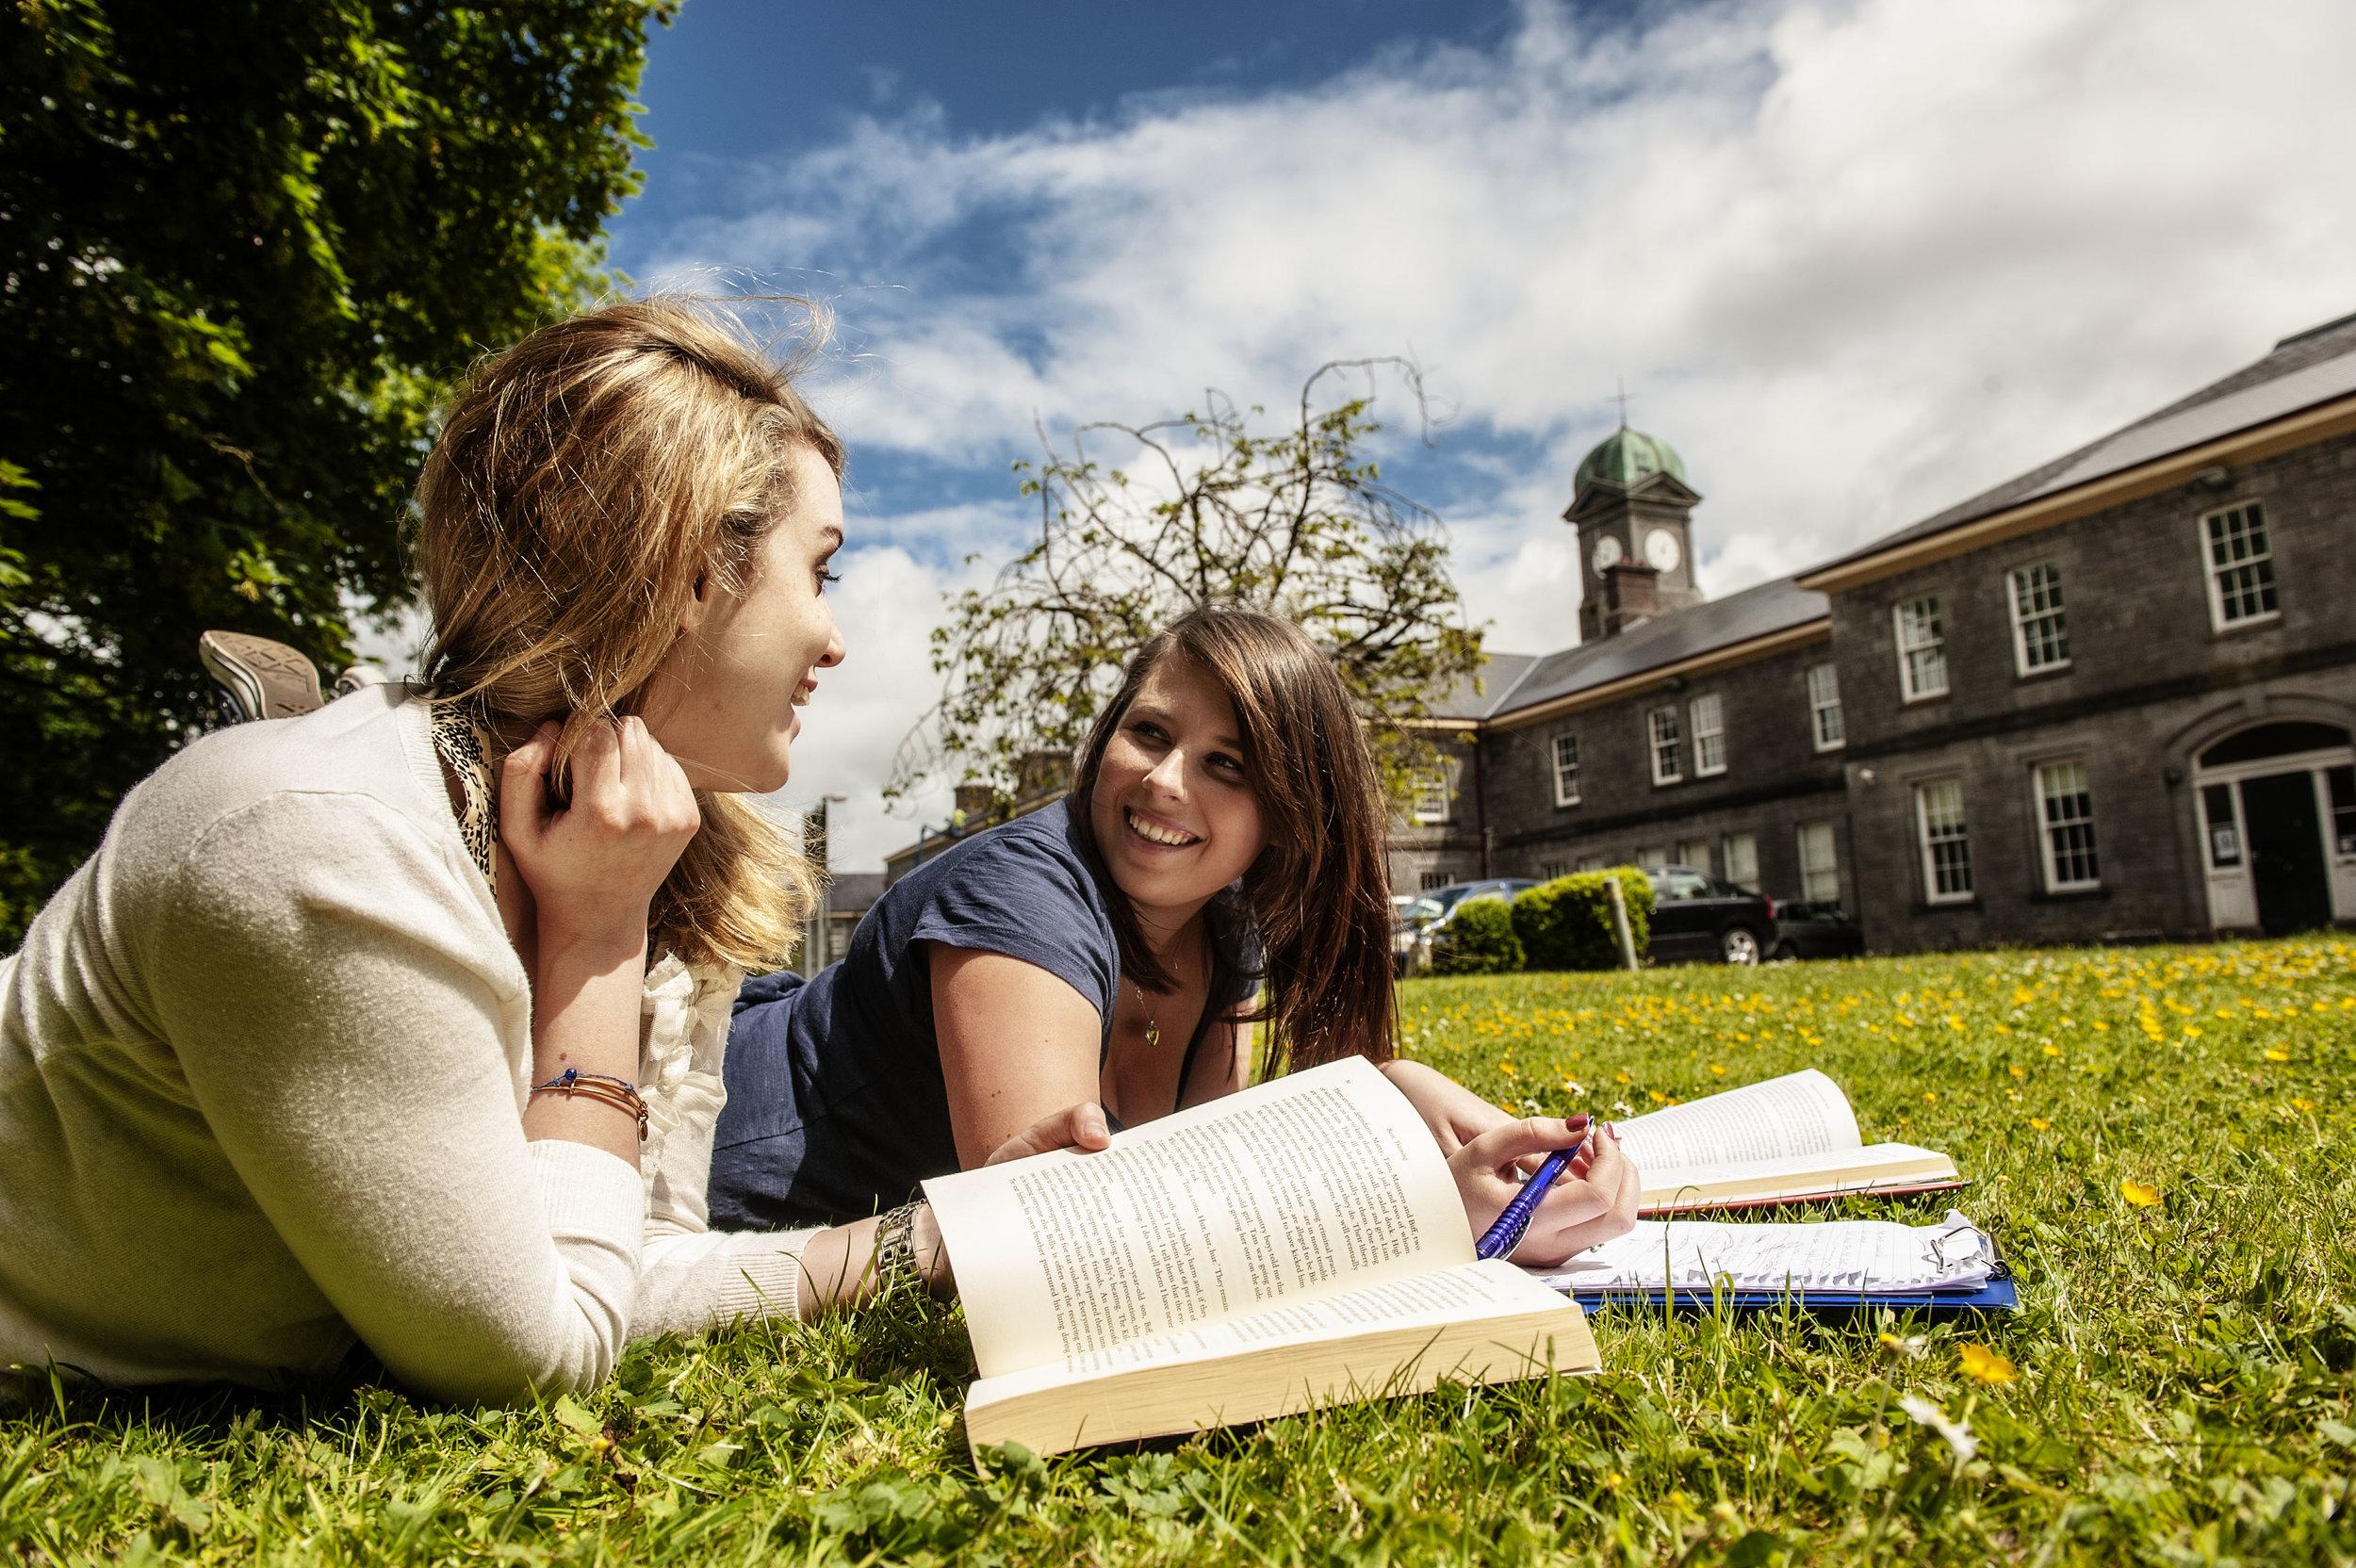 Mayo_Ireland_Photographer_GMIT_Campus.jpg